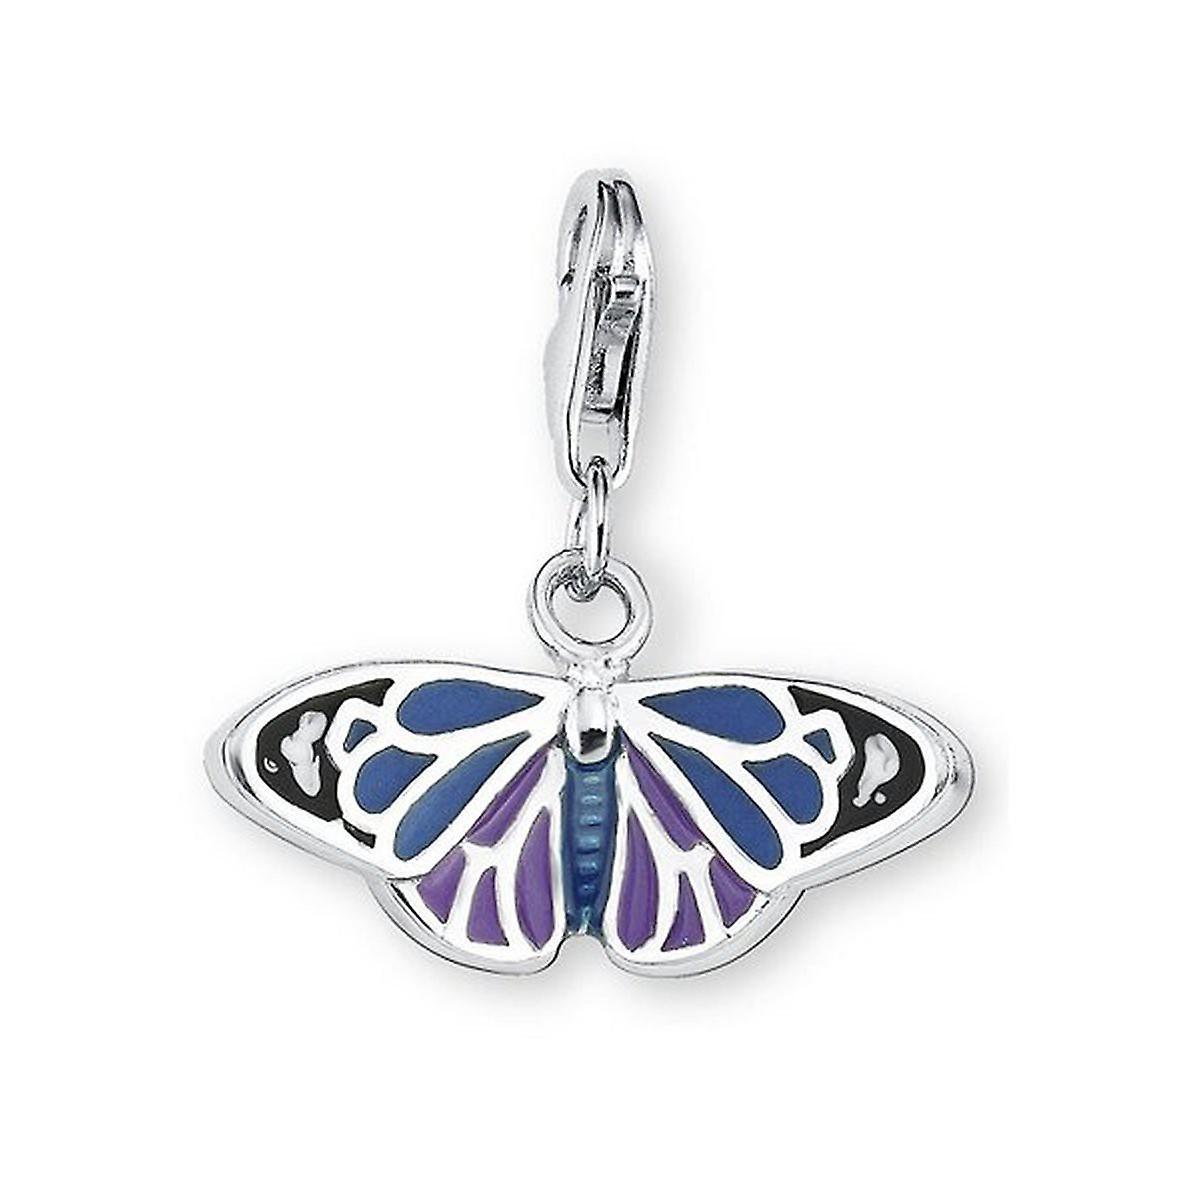 s.Oliver Jewel Damen Anhänger Silber Schmetterling SOCHA/147 - 393379